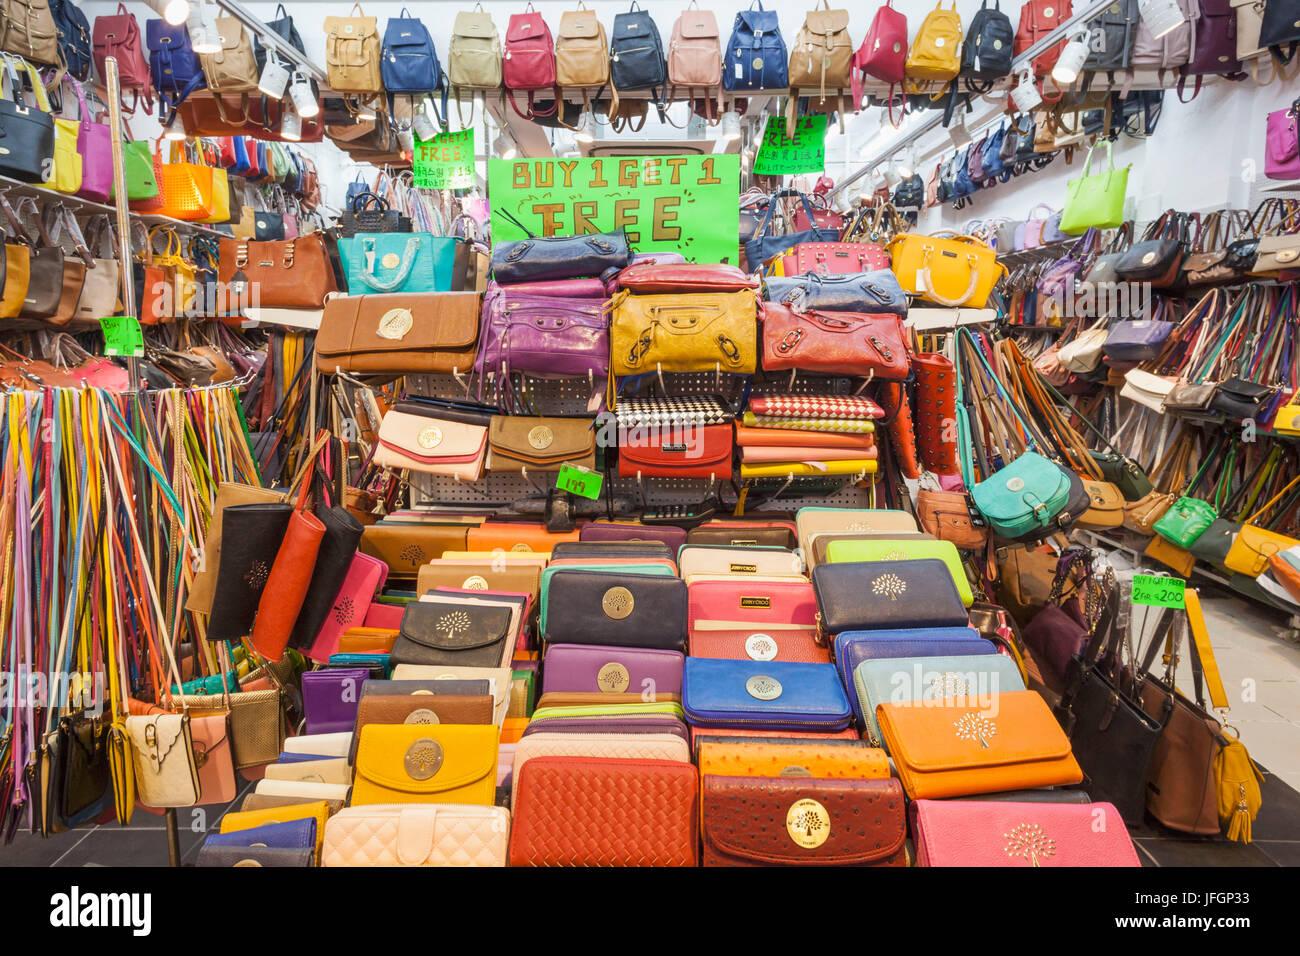 Shop Display Of Fake Purses And Handbags Stockfotos und